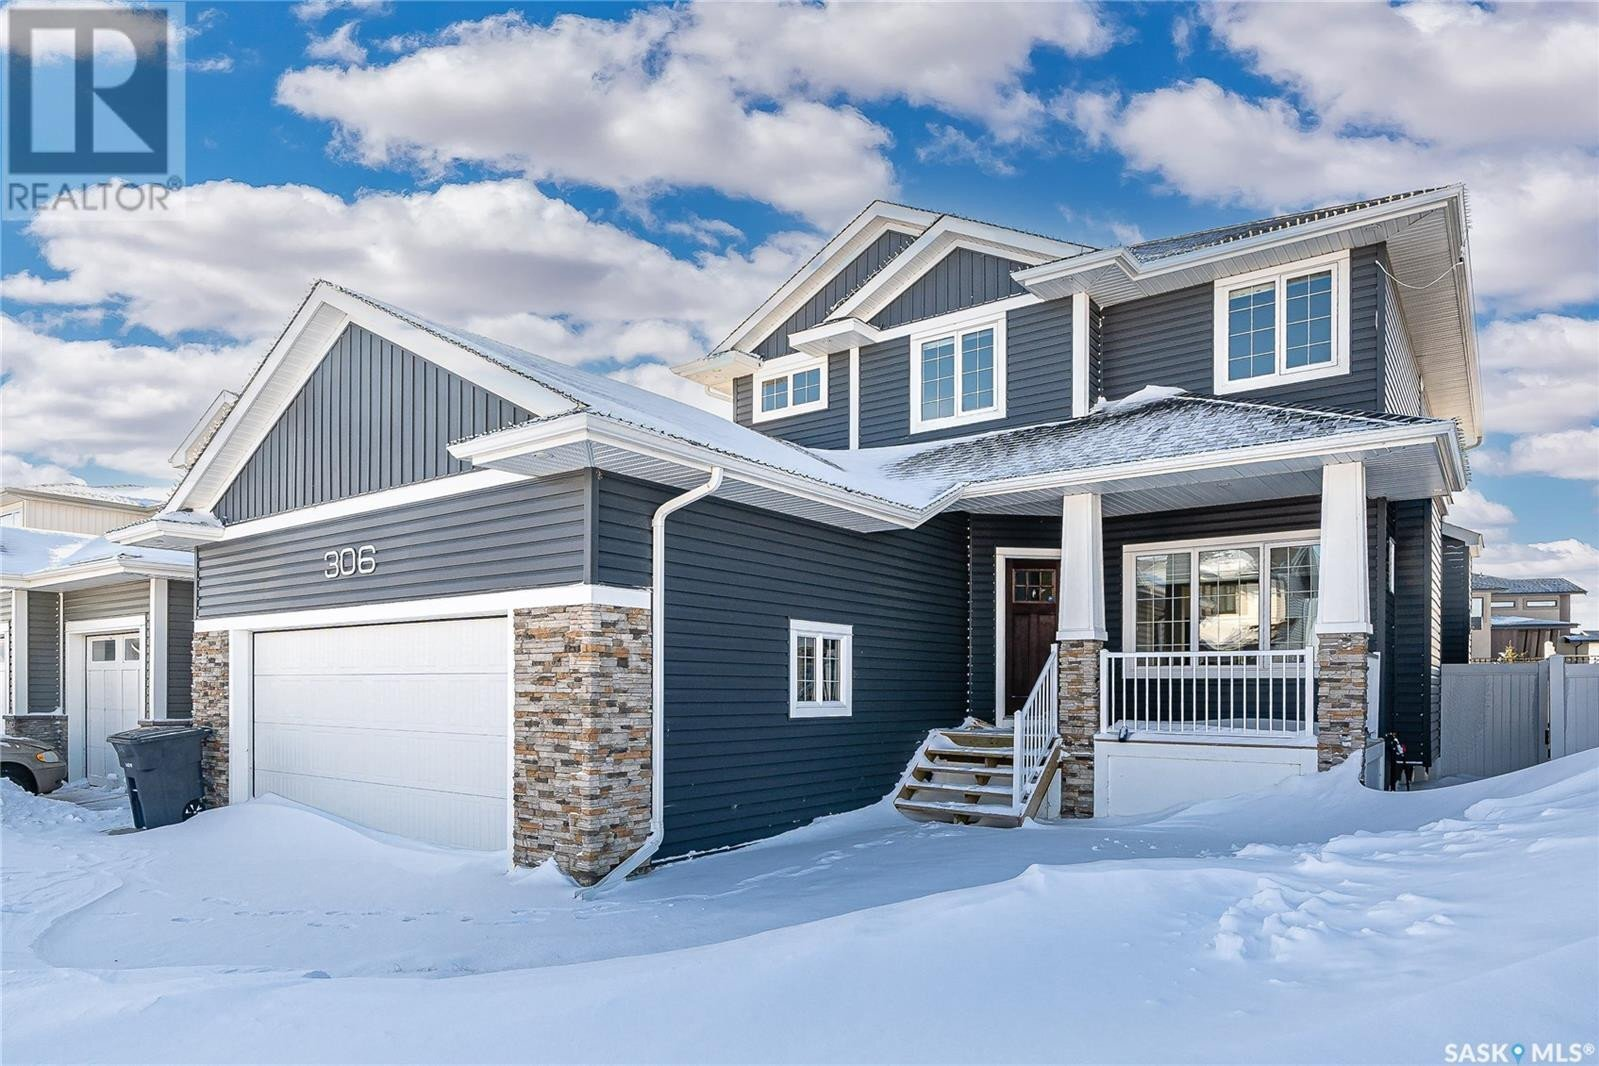 House for sale at 306 Secord Wy Saskatoon Saskatchewan - MLS: SK833293